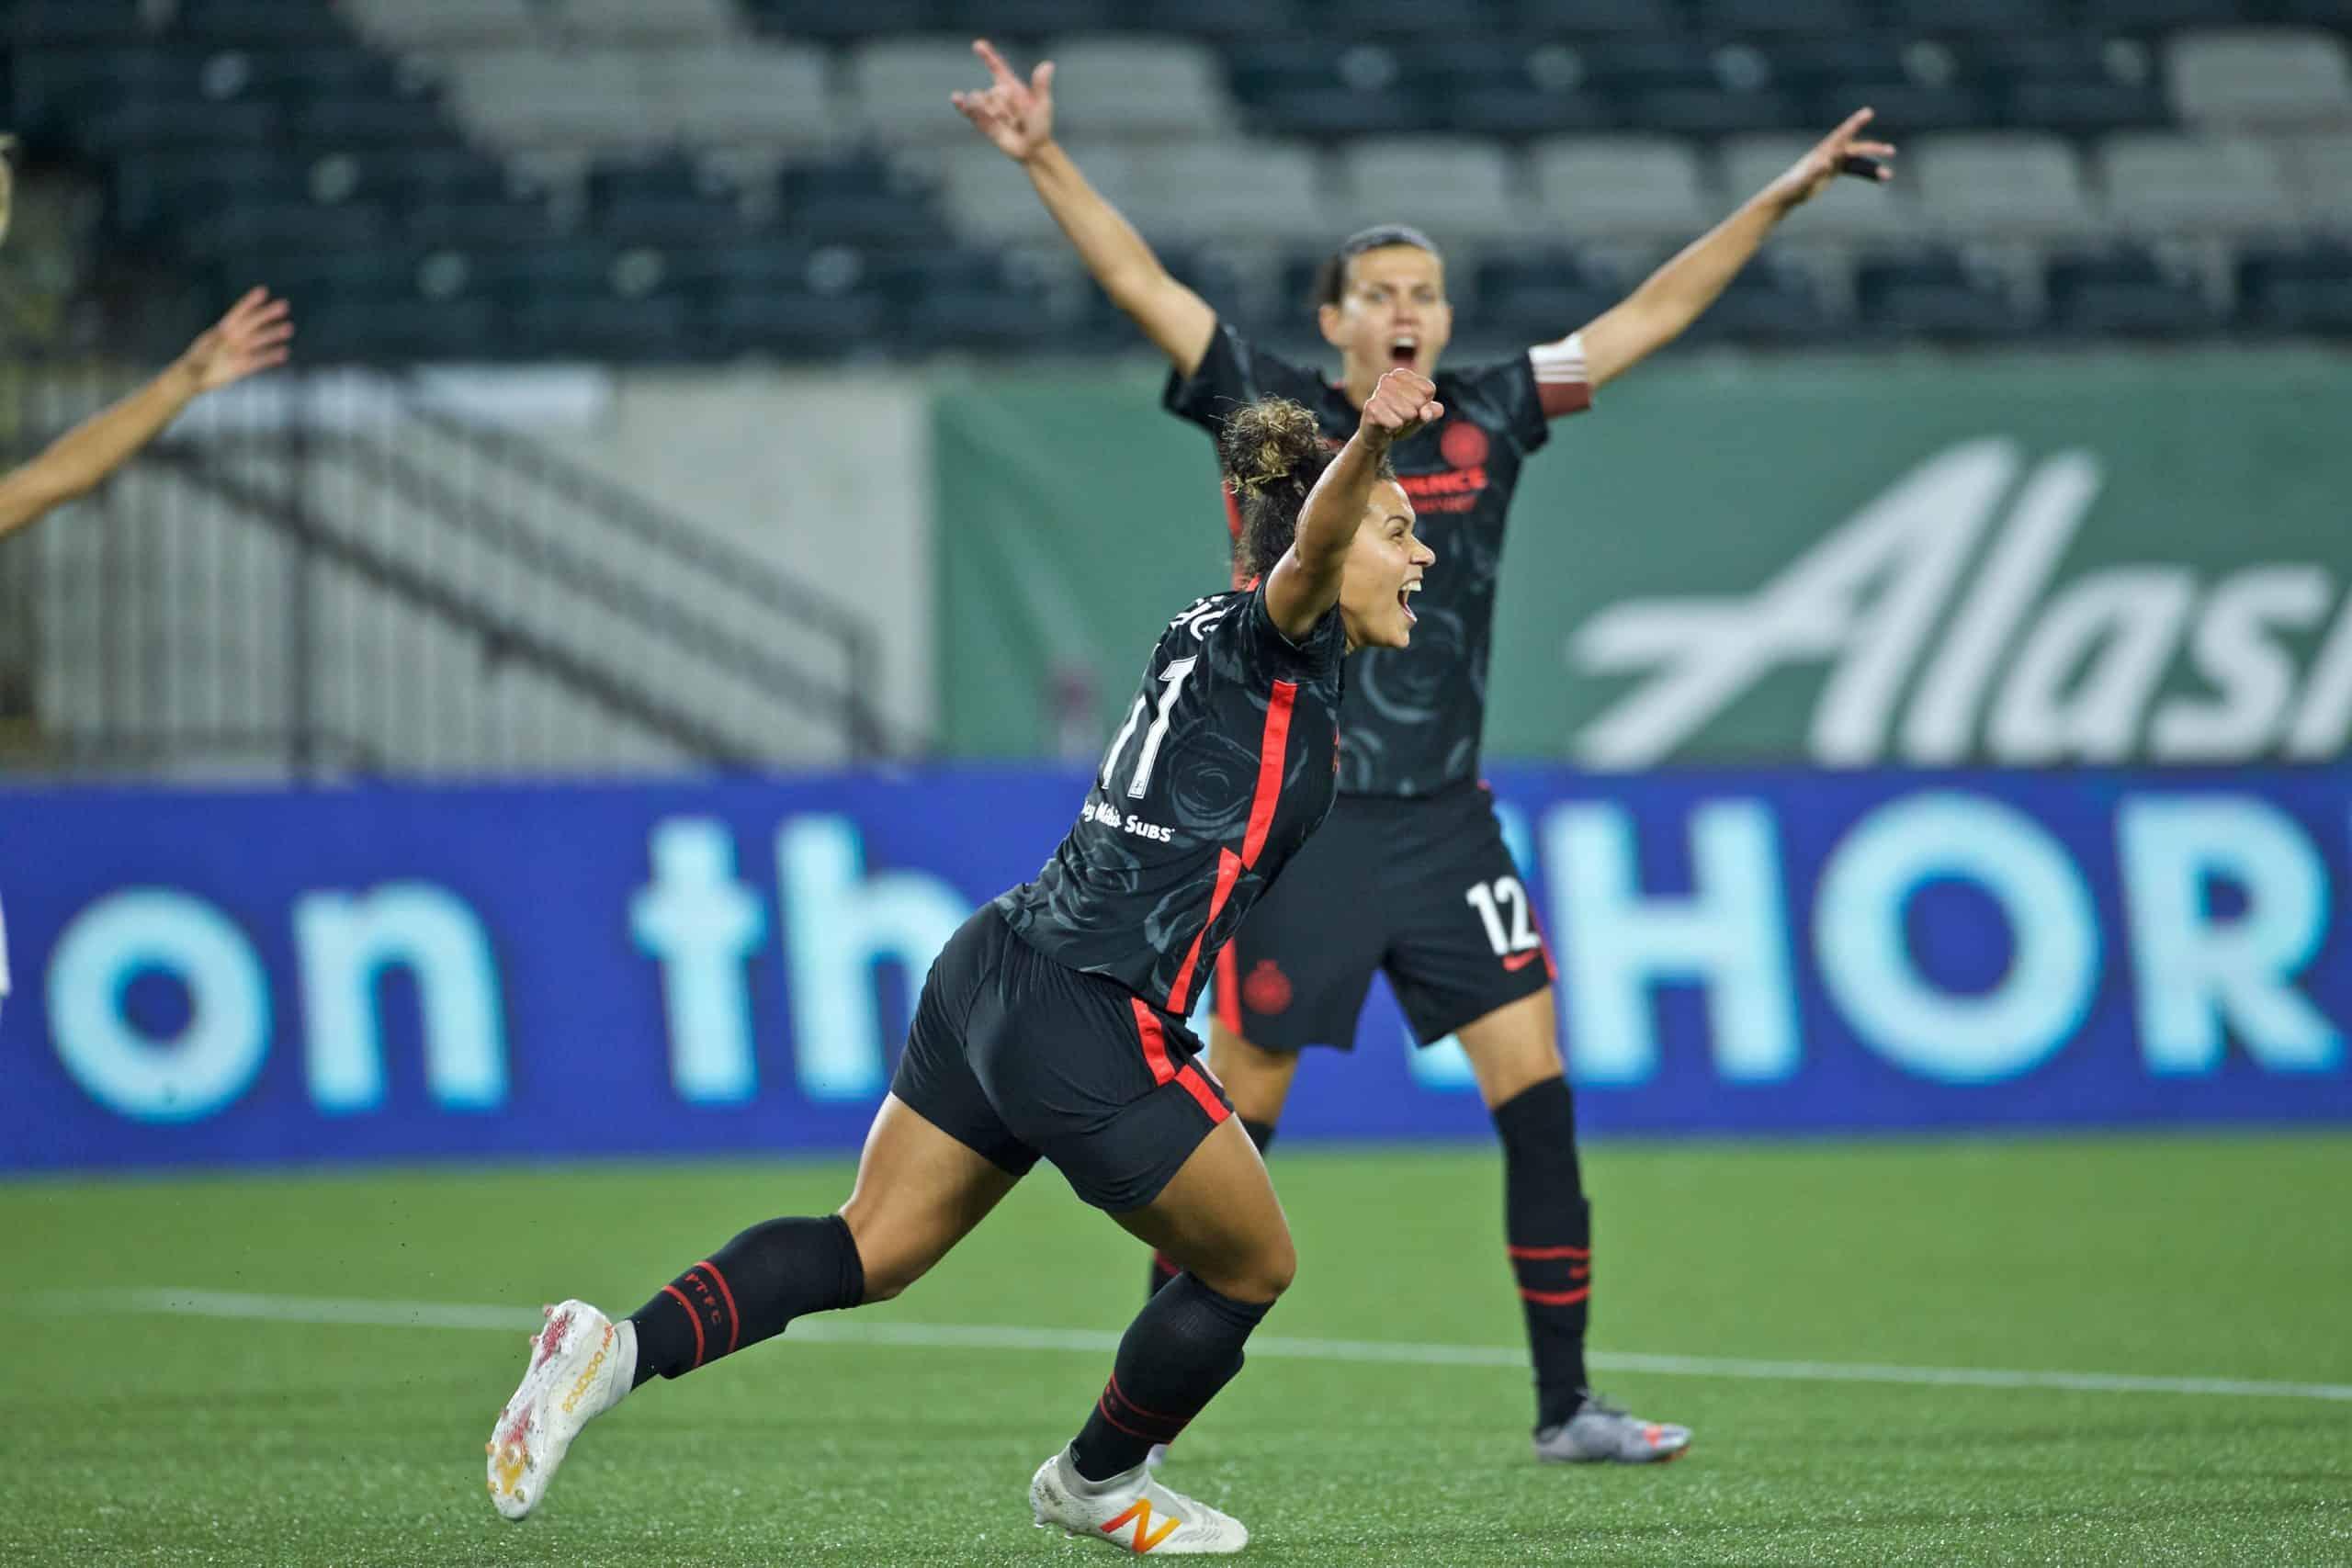 Raquel Rodríguez celebrates a goal with the Portland Thorns on September 30, 2020.